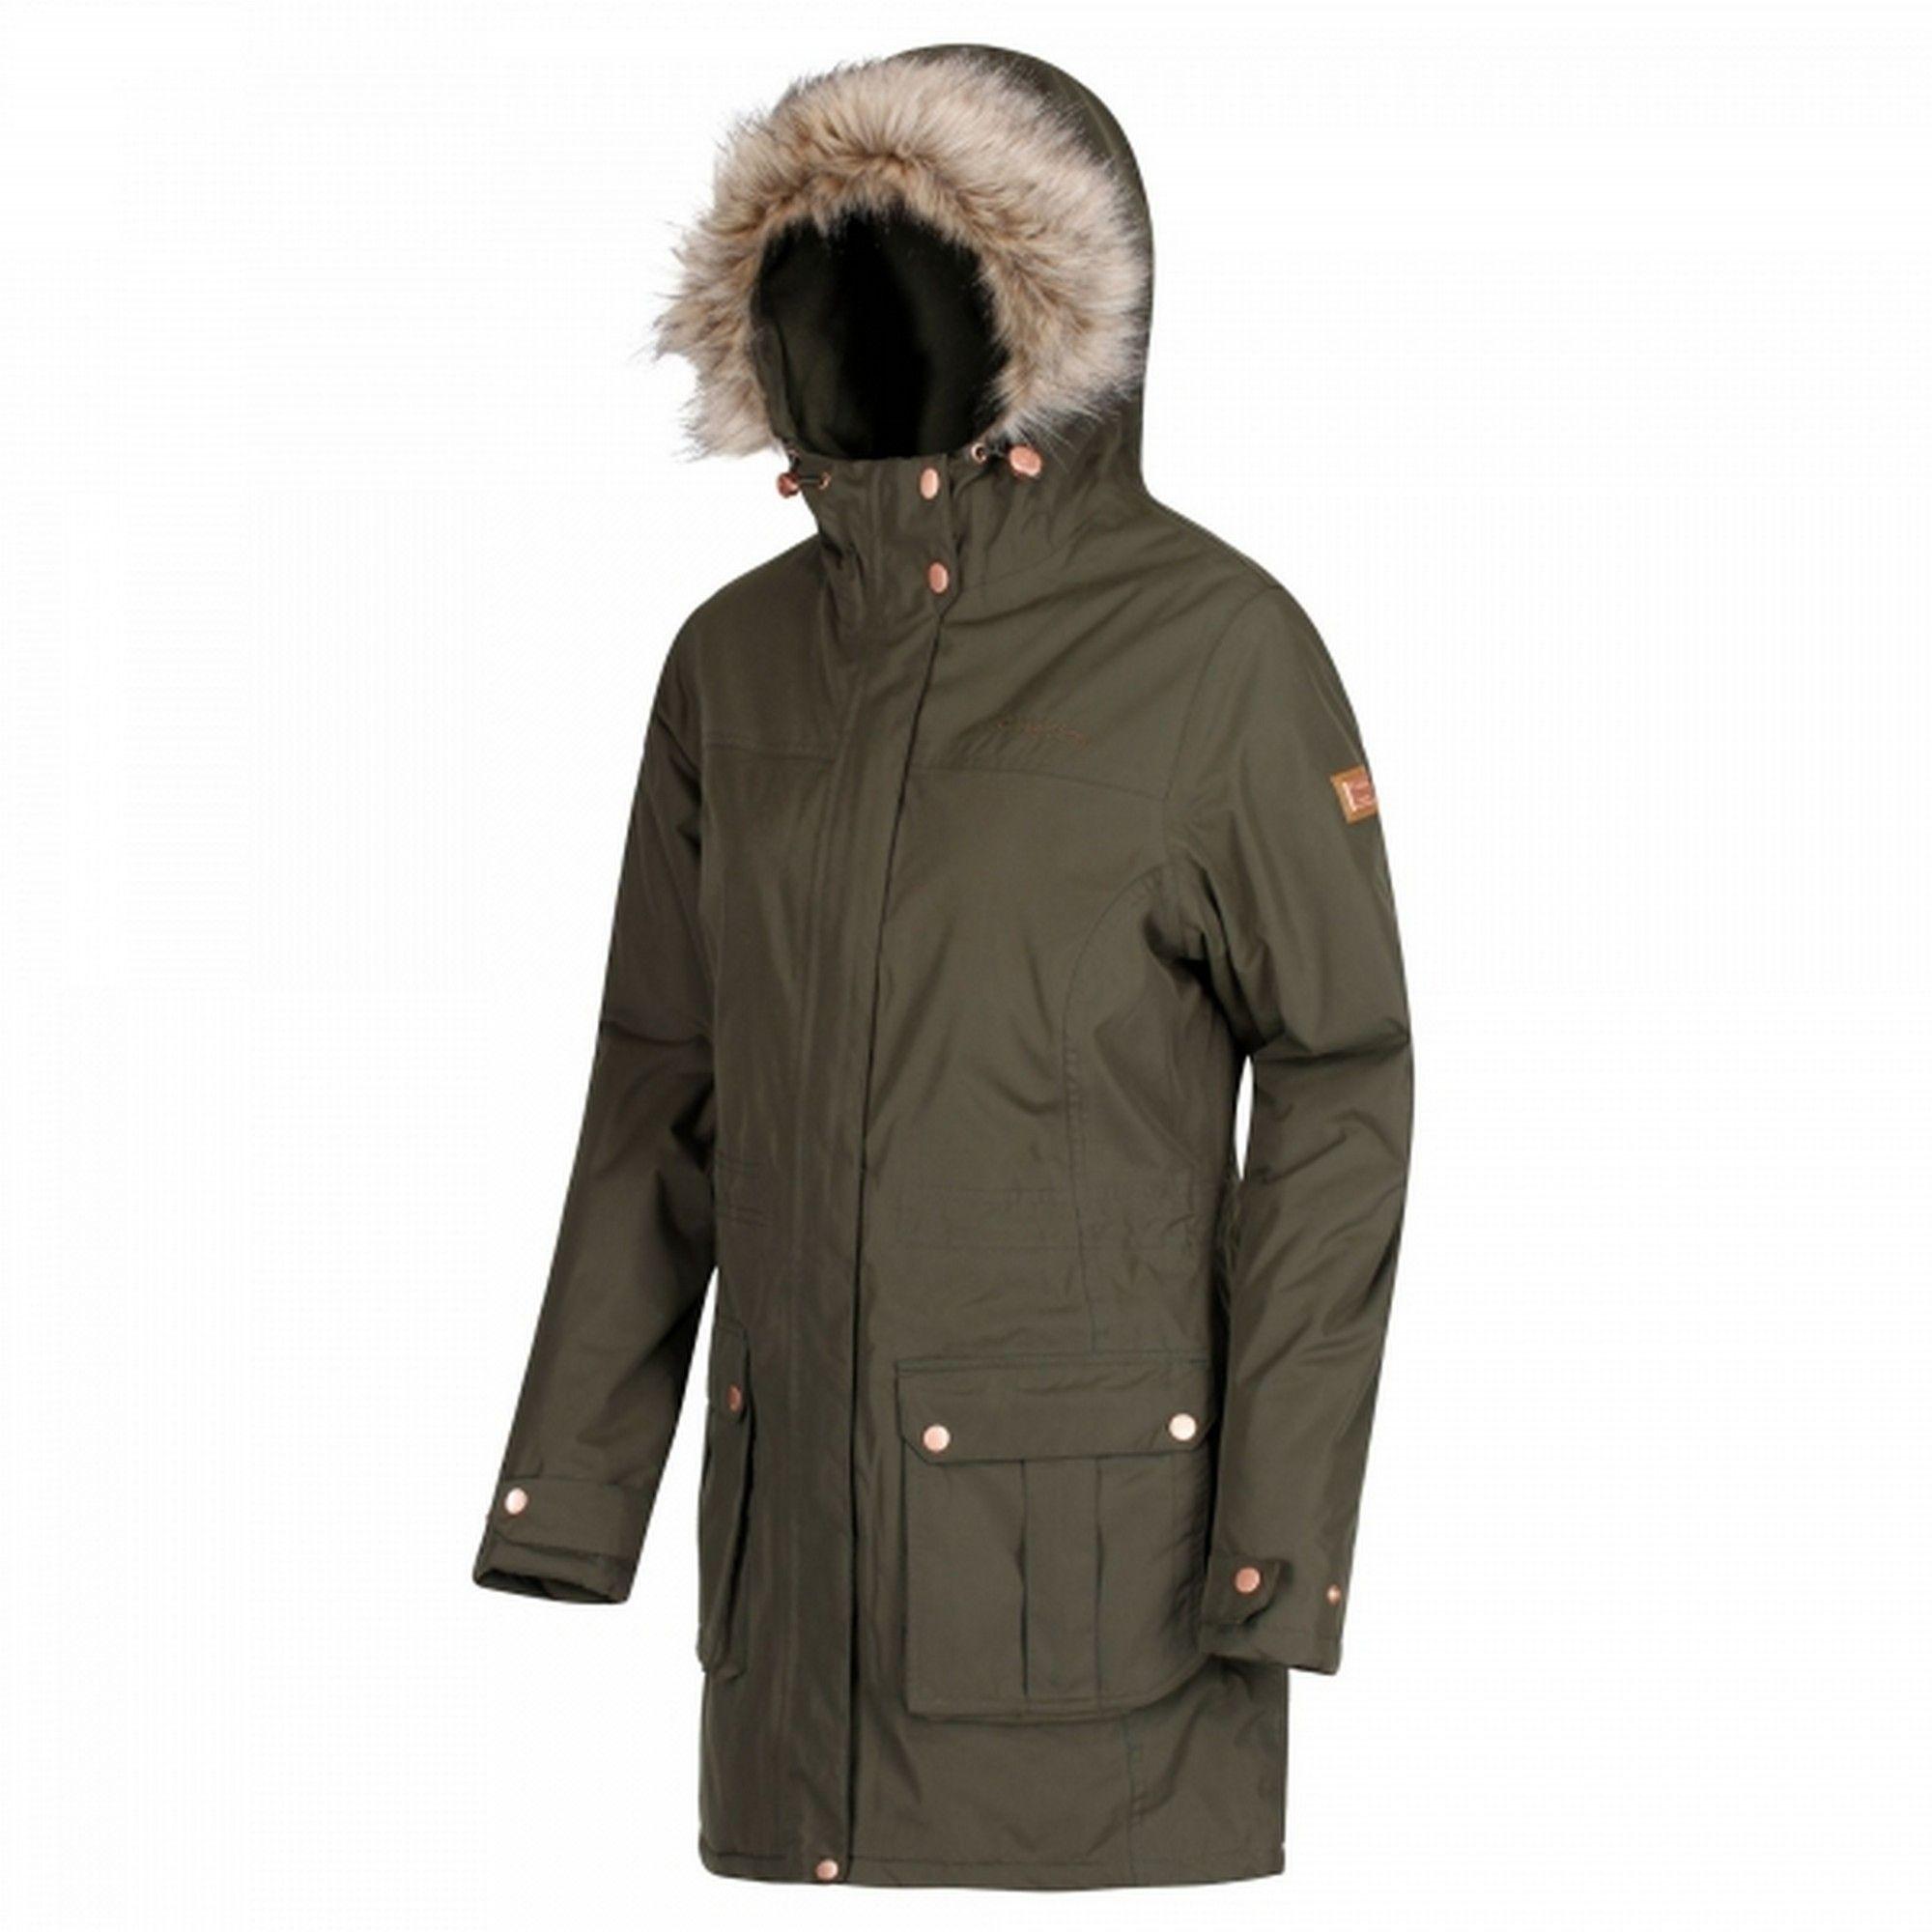 Regatta Womens/Ladies Sherlyn Full Length Hooded Jacket